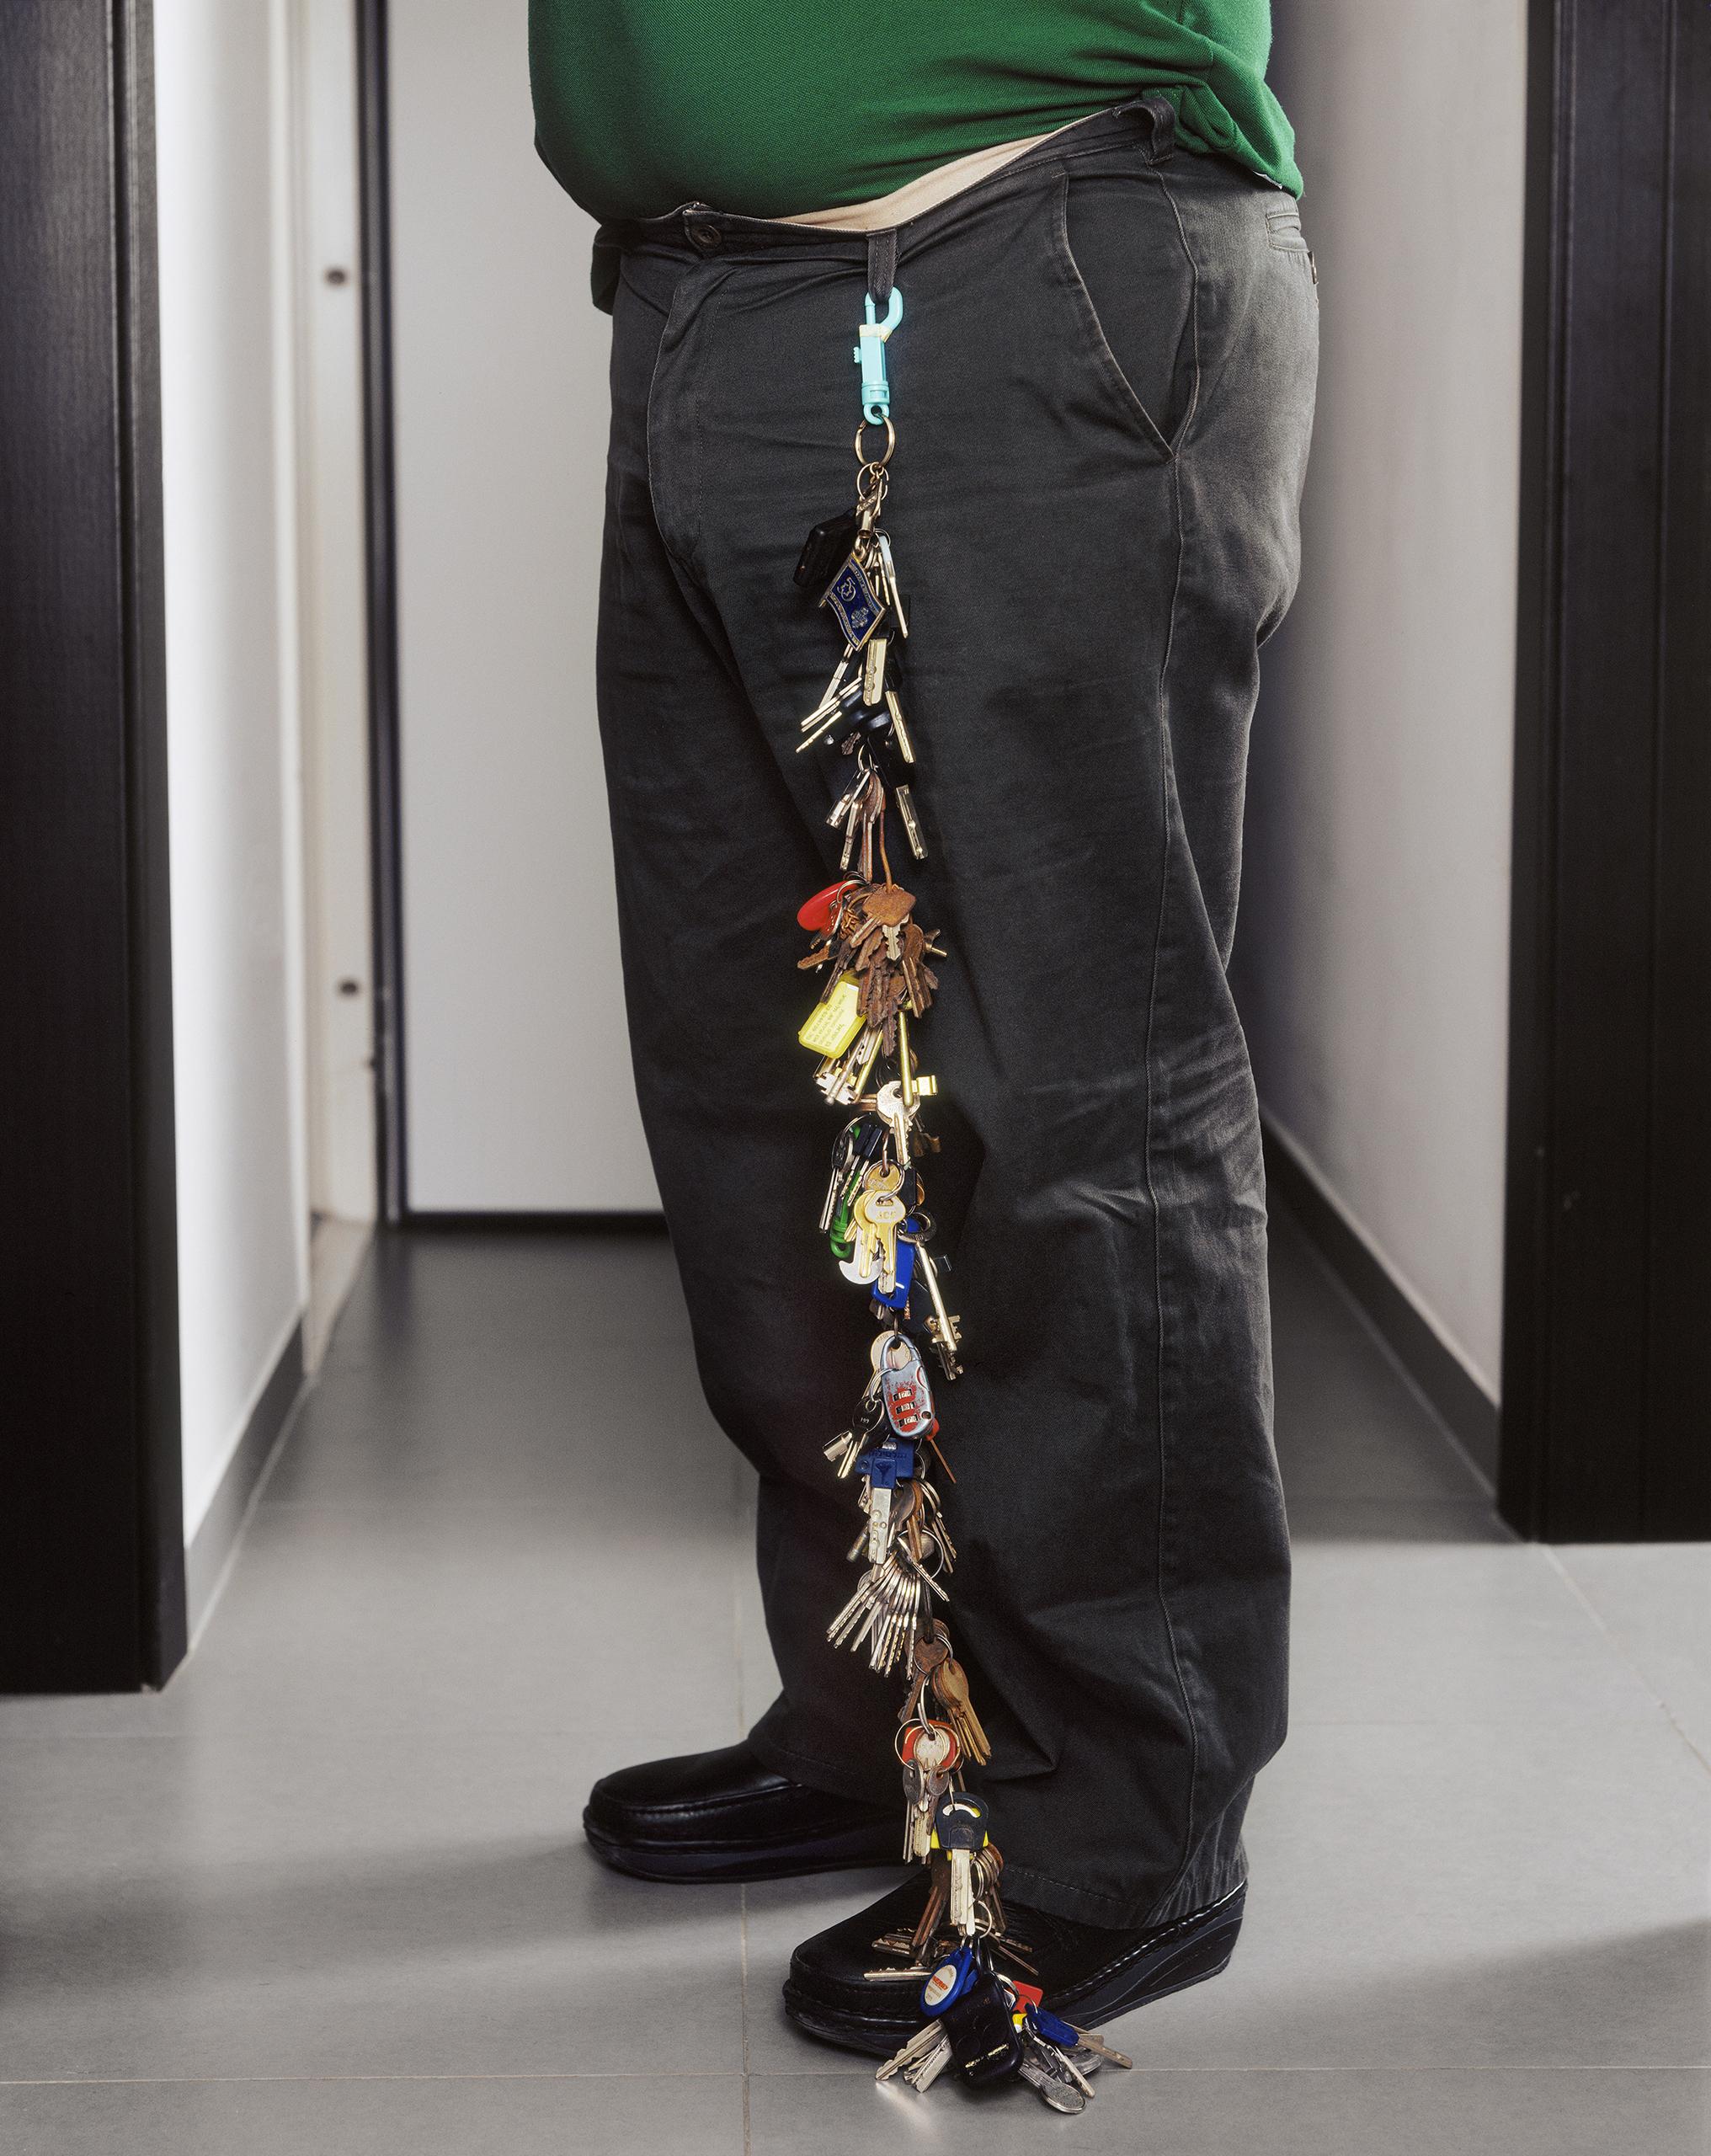 Keys (2009)